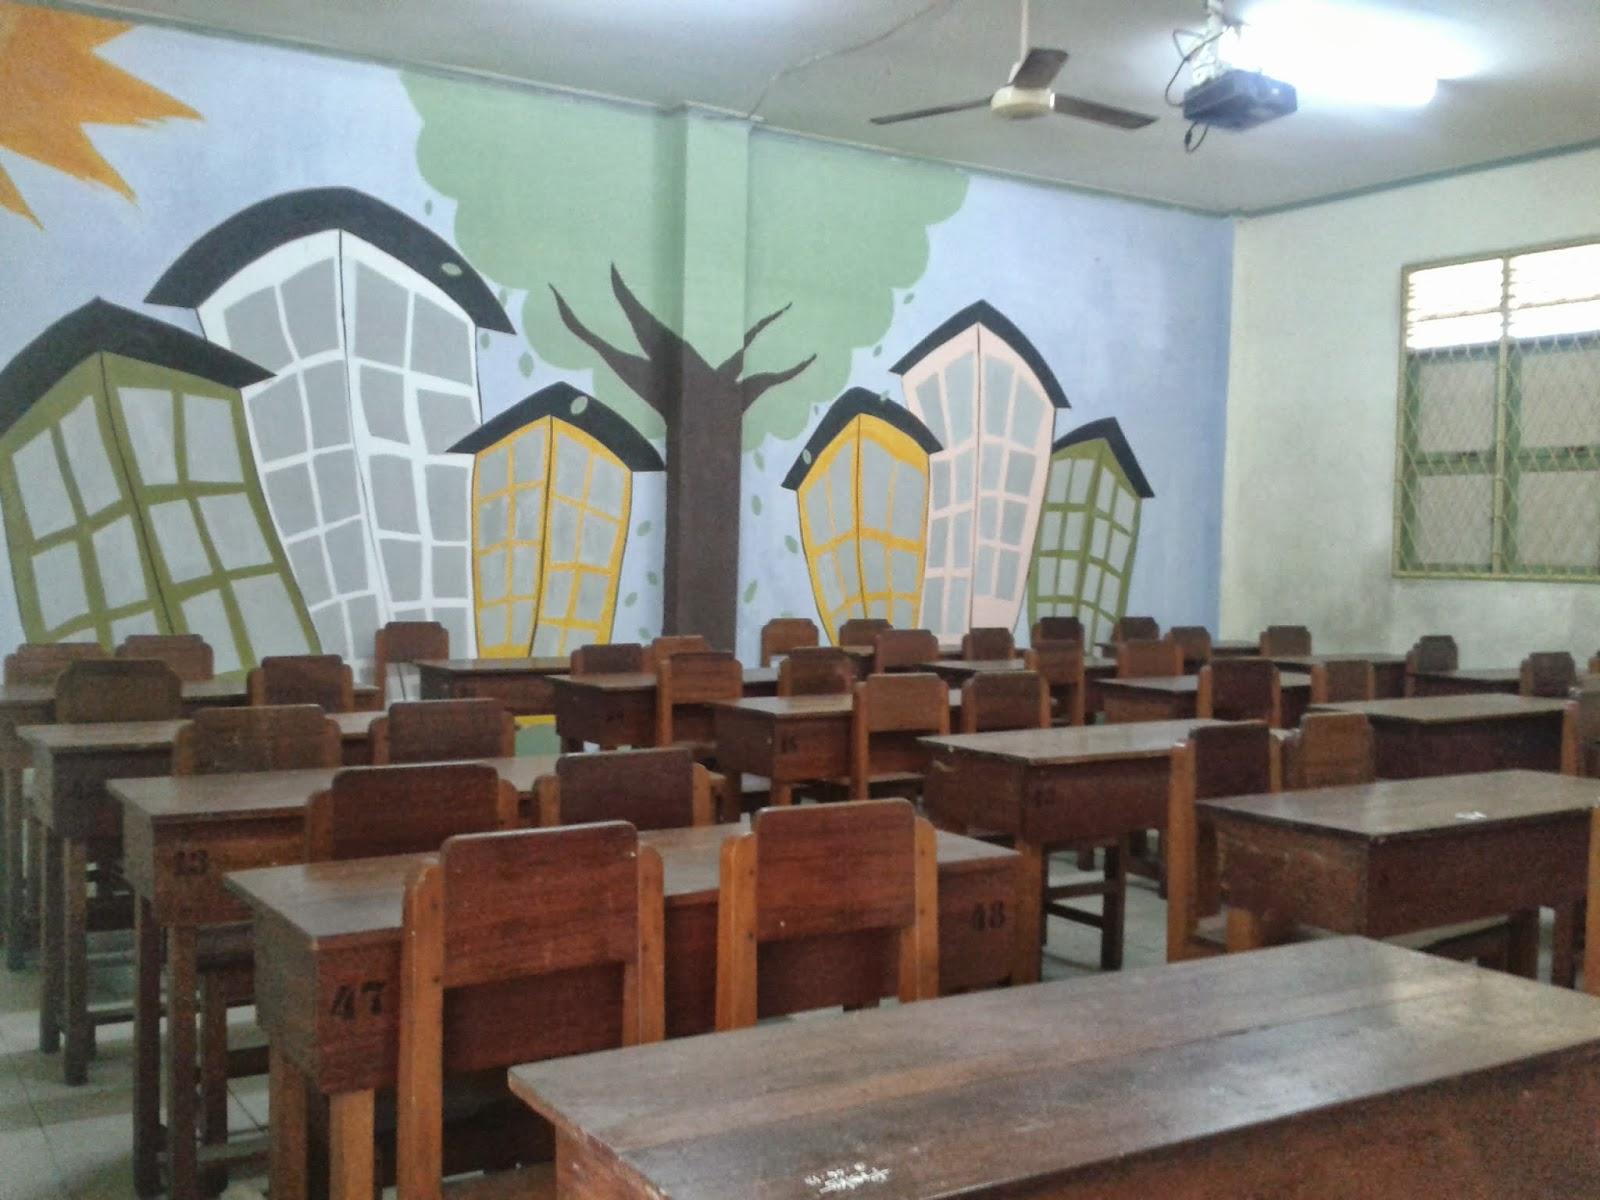 Macam Acsesoris Dekorasi Ruangan Kelas